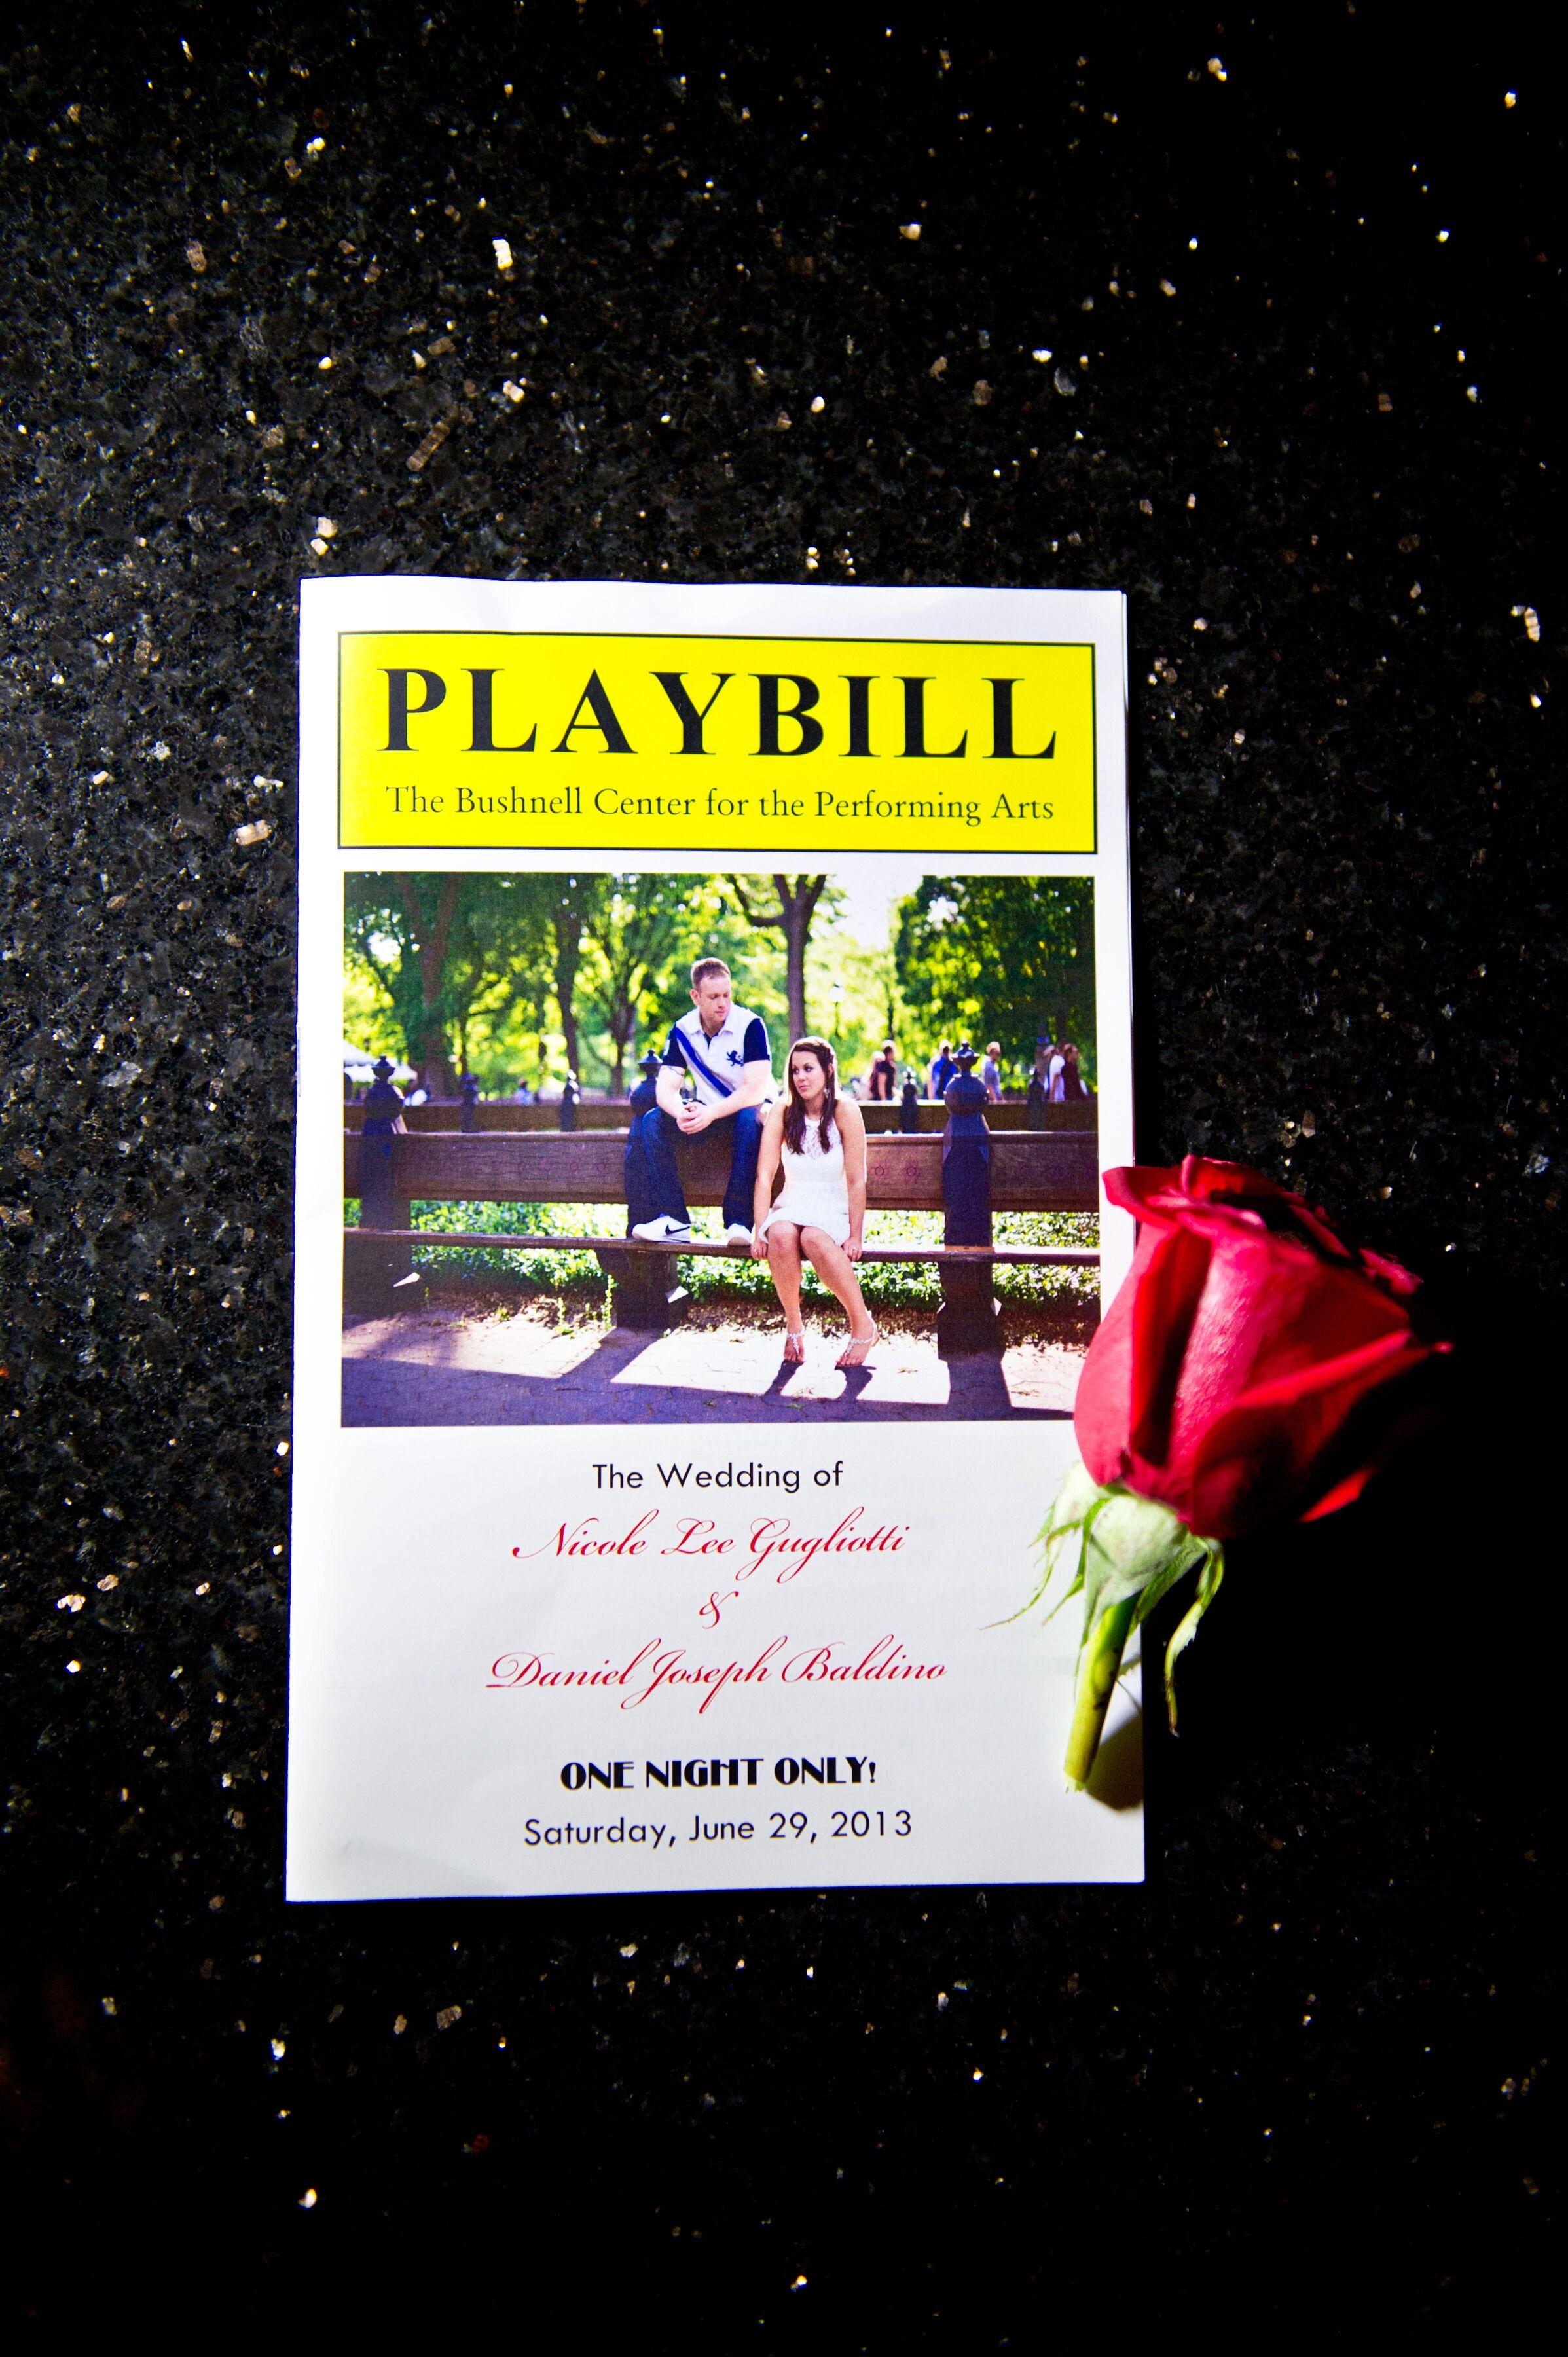 playbill as wedding program